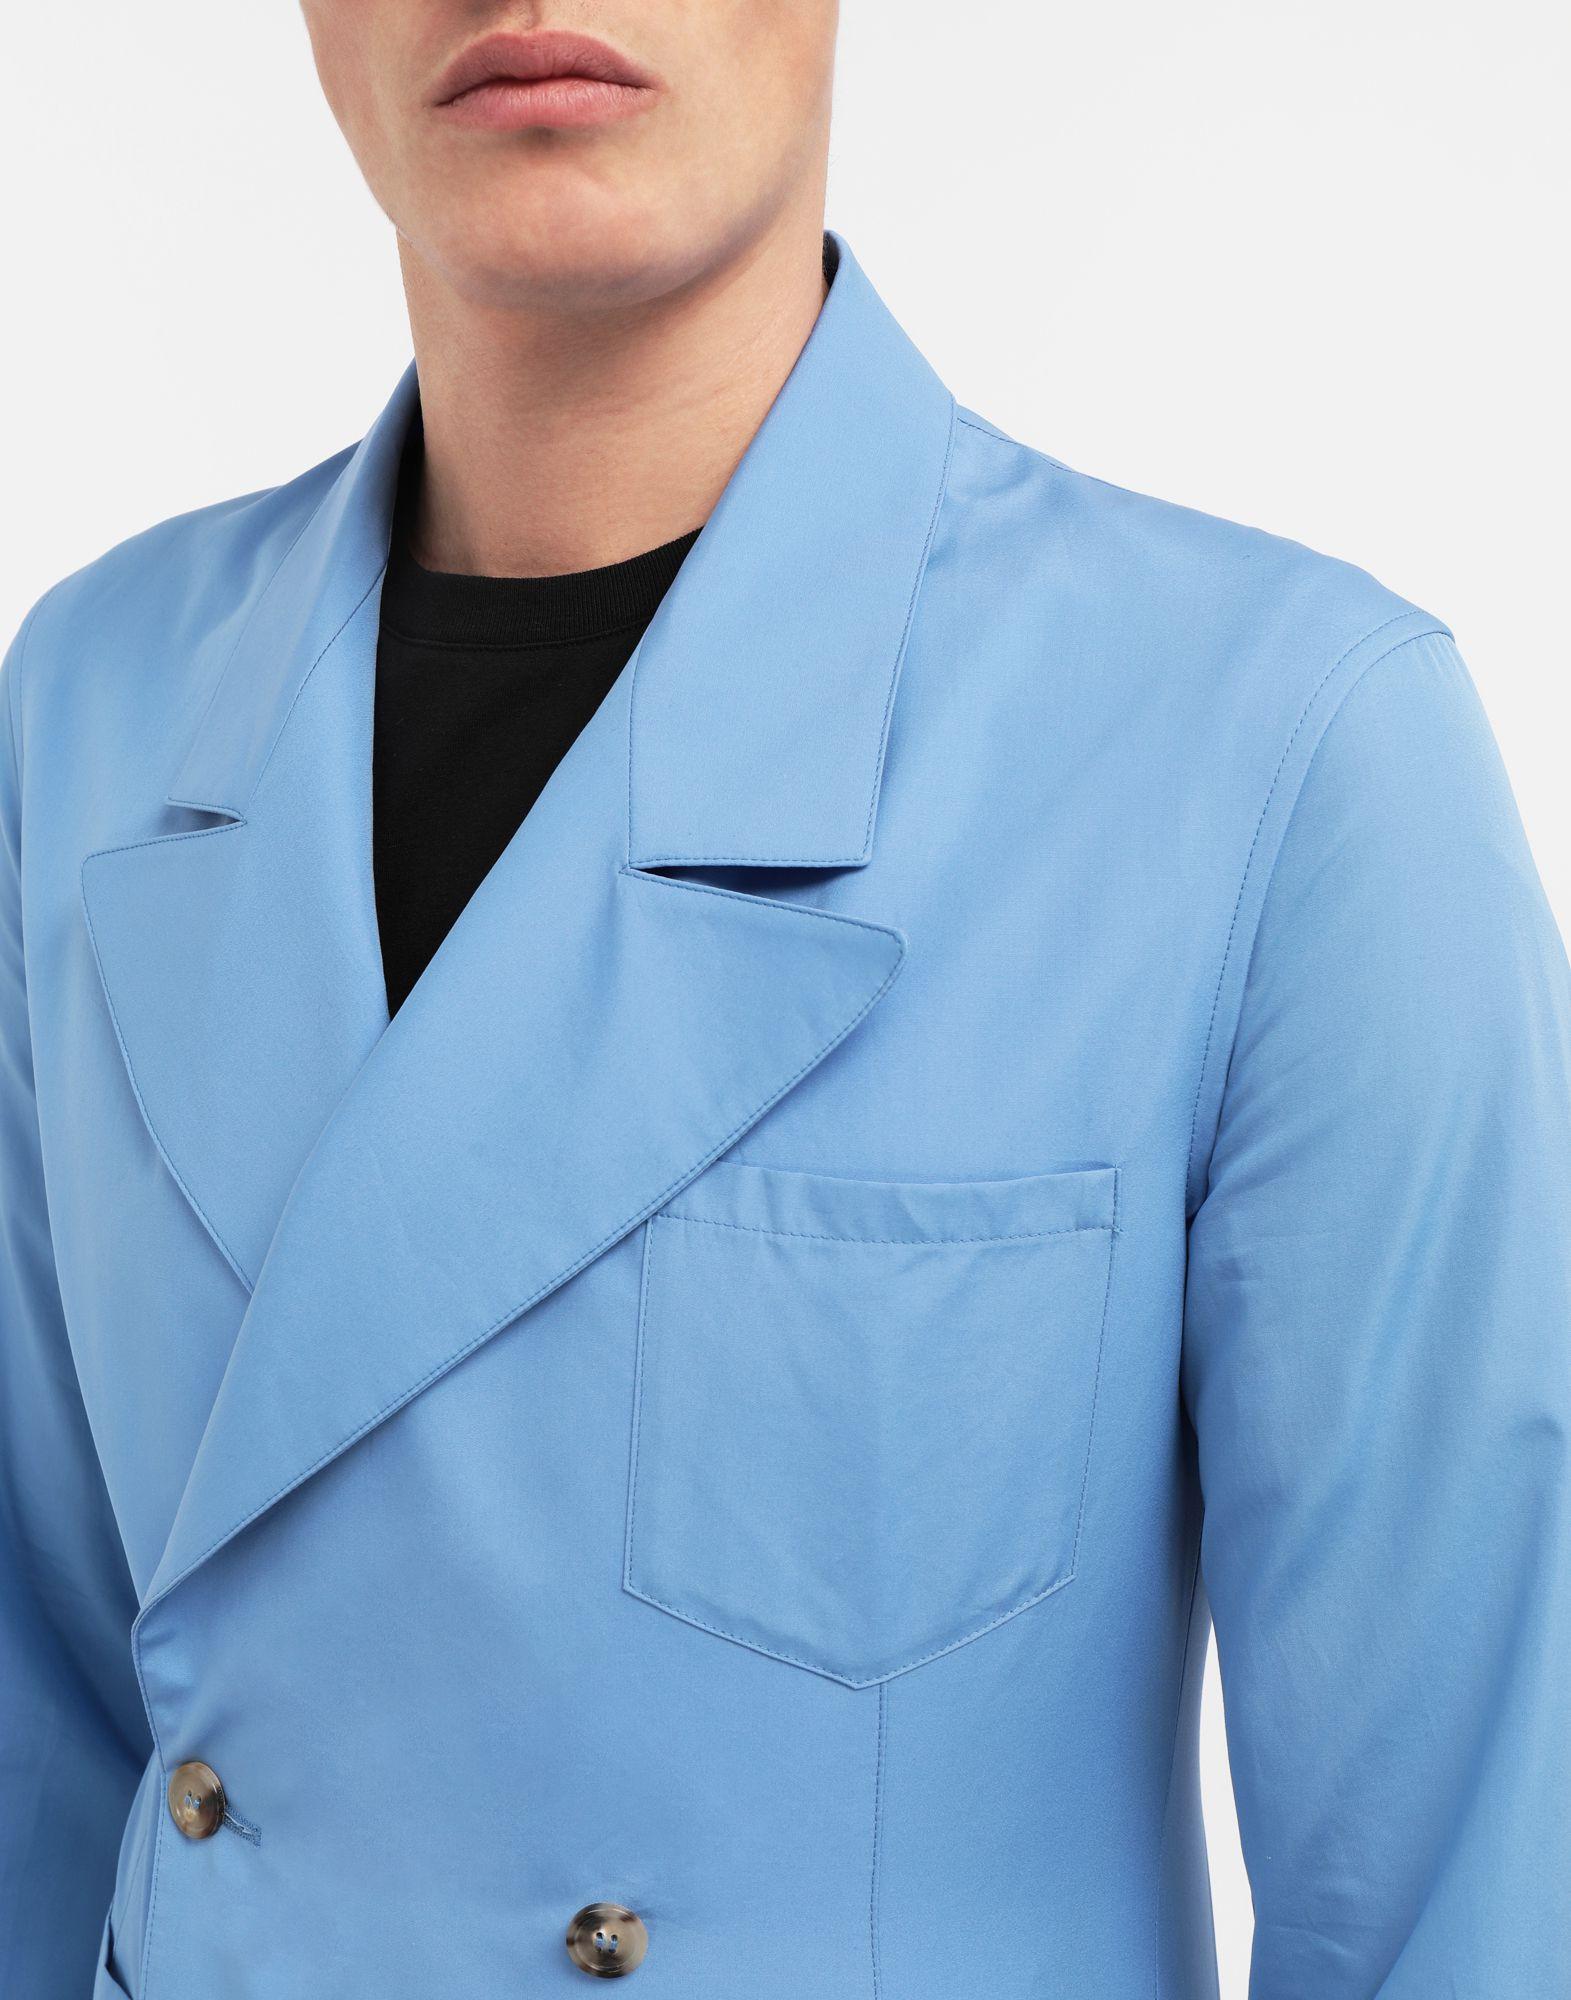 MAISON MARGIELA Double-breasted suit jacket Blazer Man a